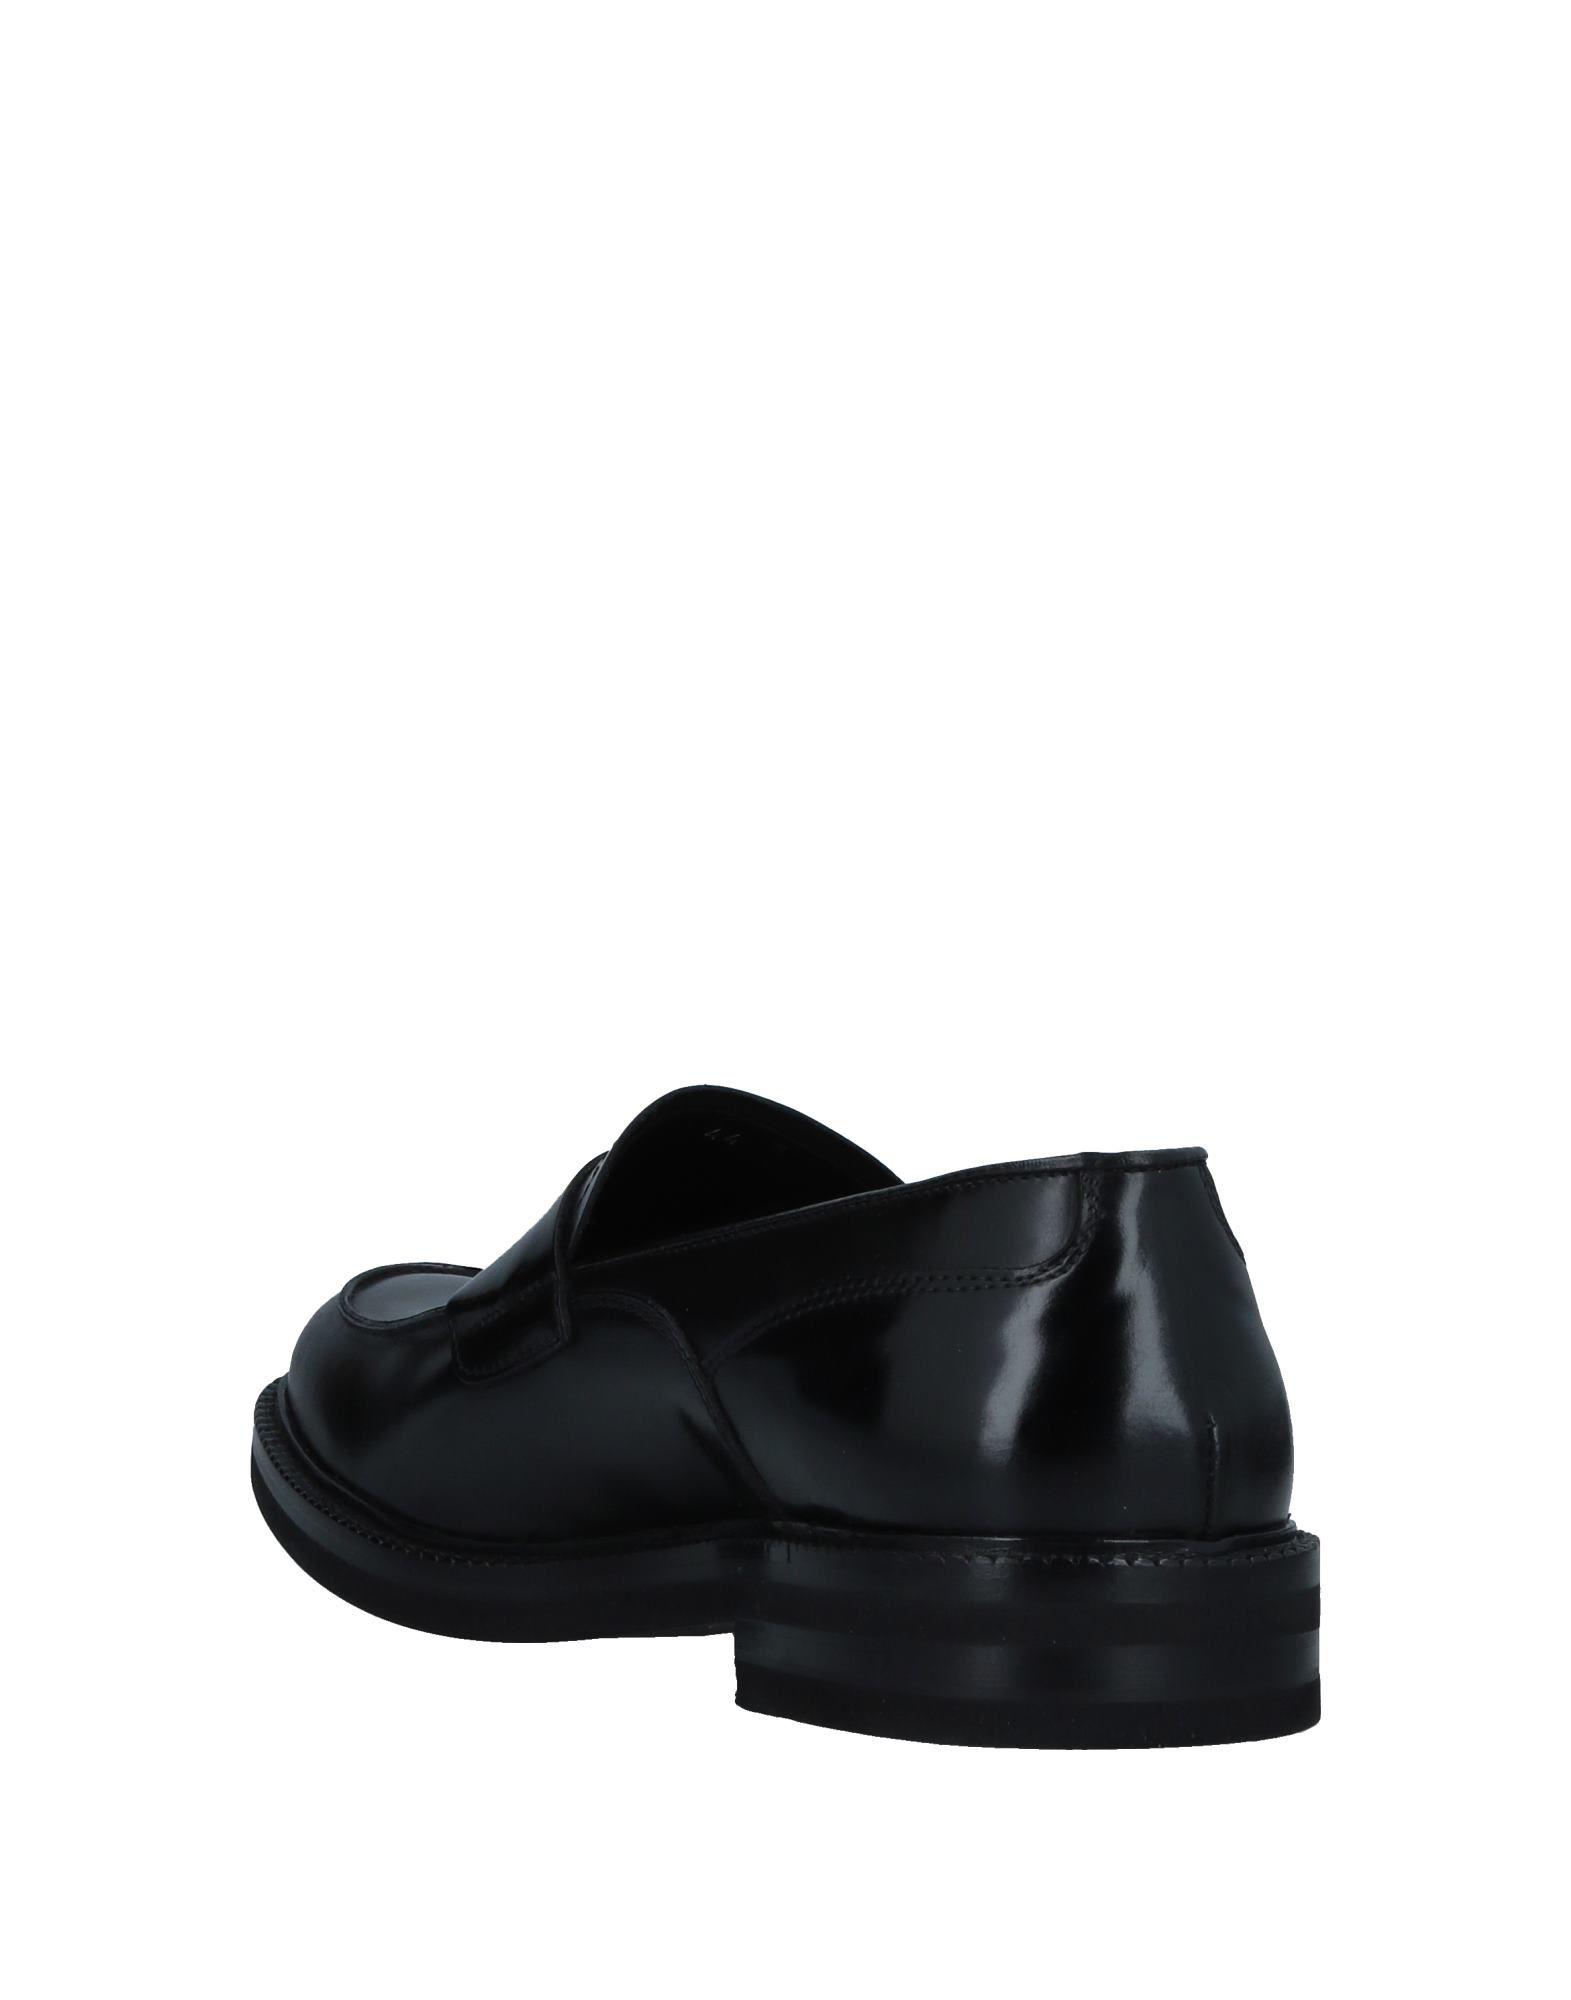 Calzoleria Napoletana Napoletana Calzoleria  1921 Mokassins Herren  11527051PO Gute Qualität beliebte Schuhe 0c37eb